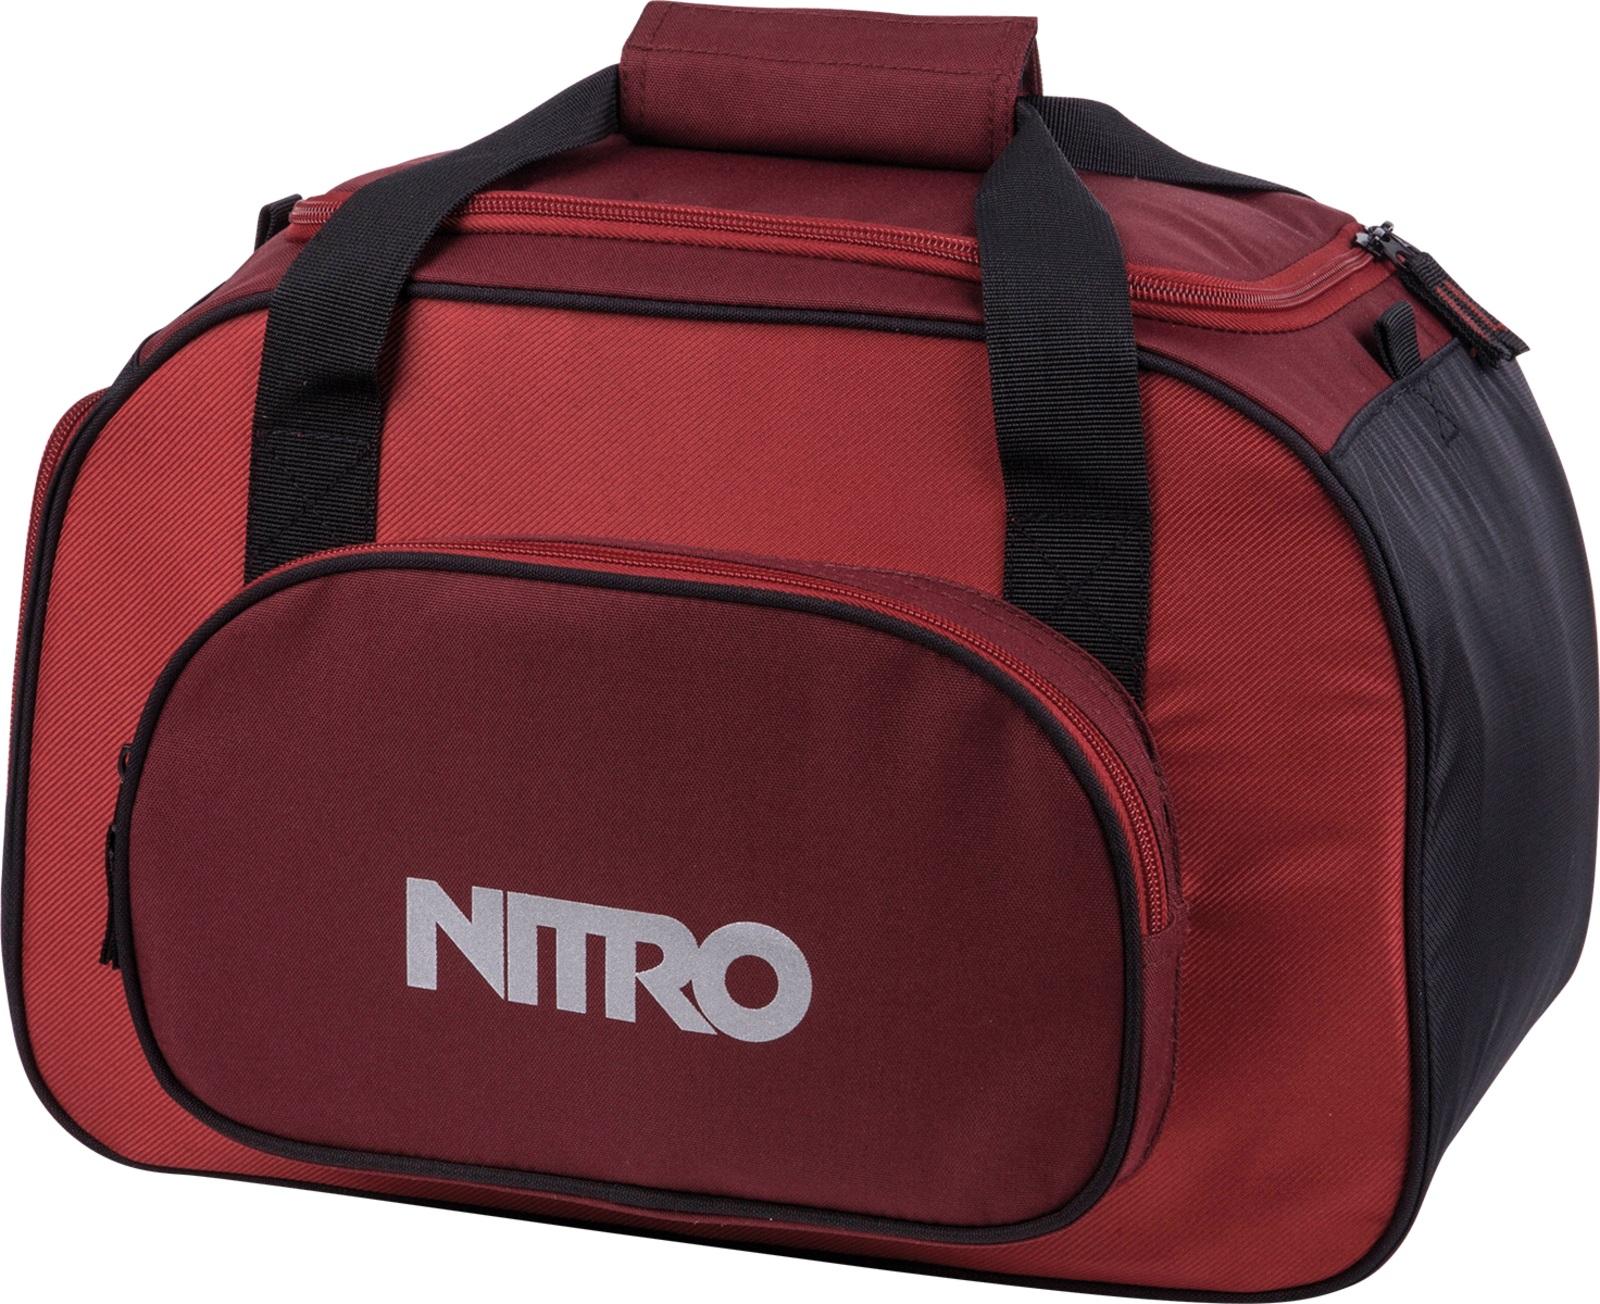 Nitro taška Team Duffle BAG XS chili 35L